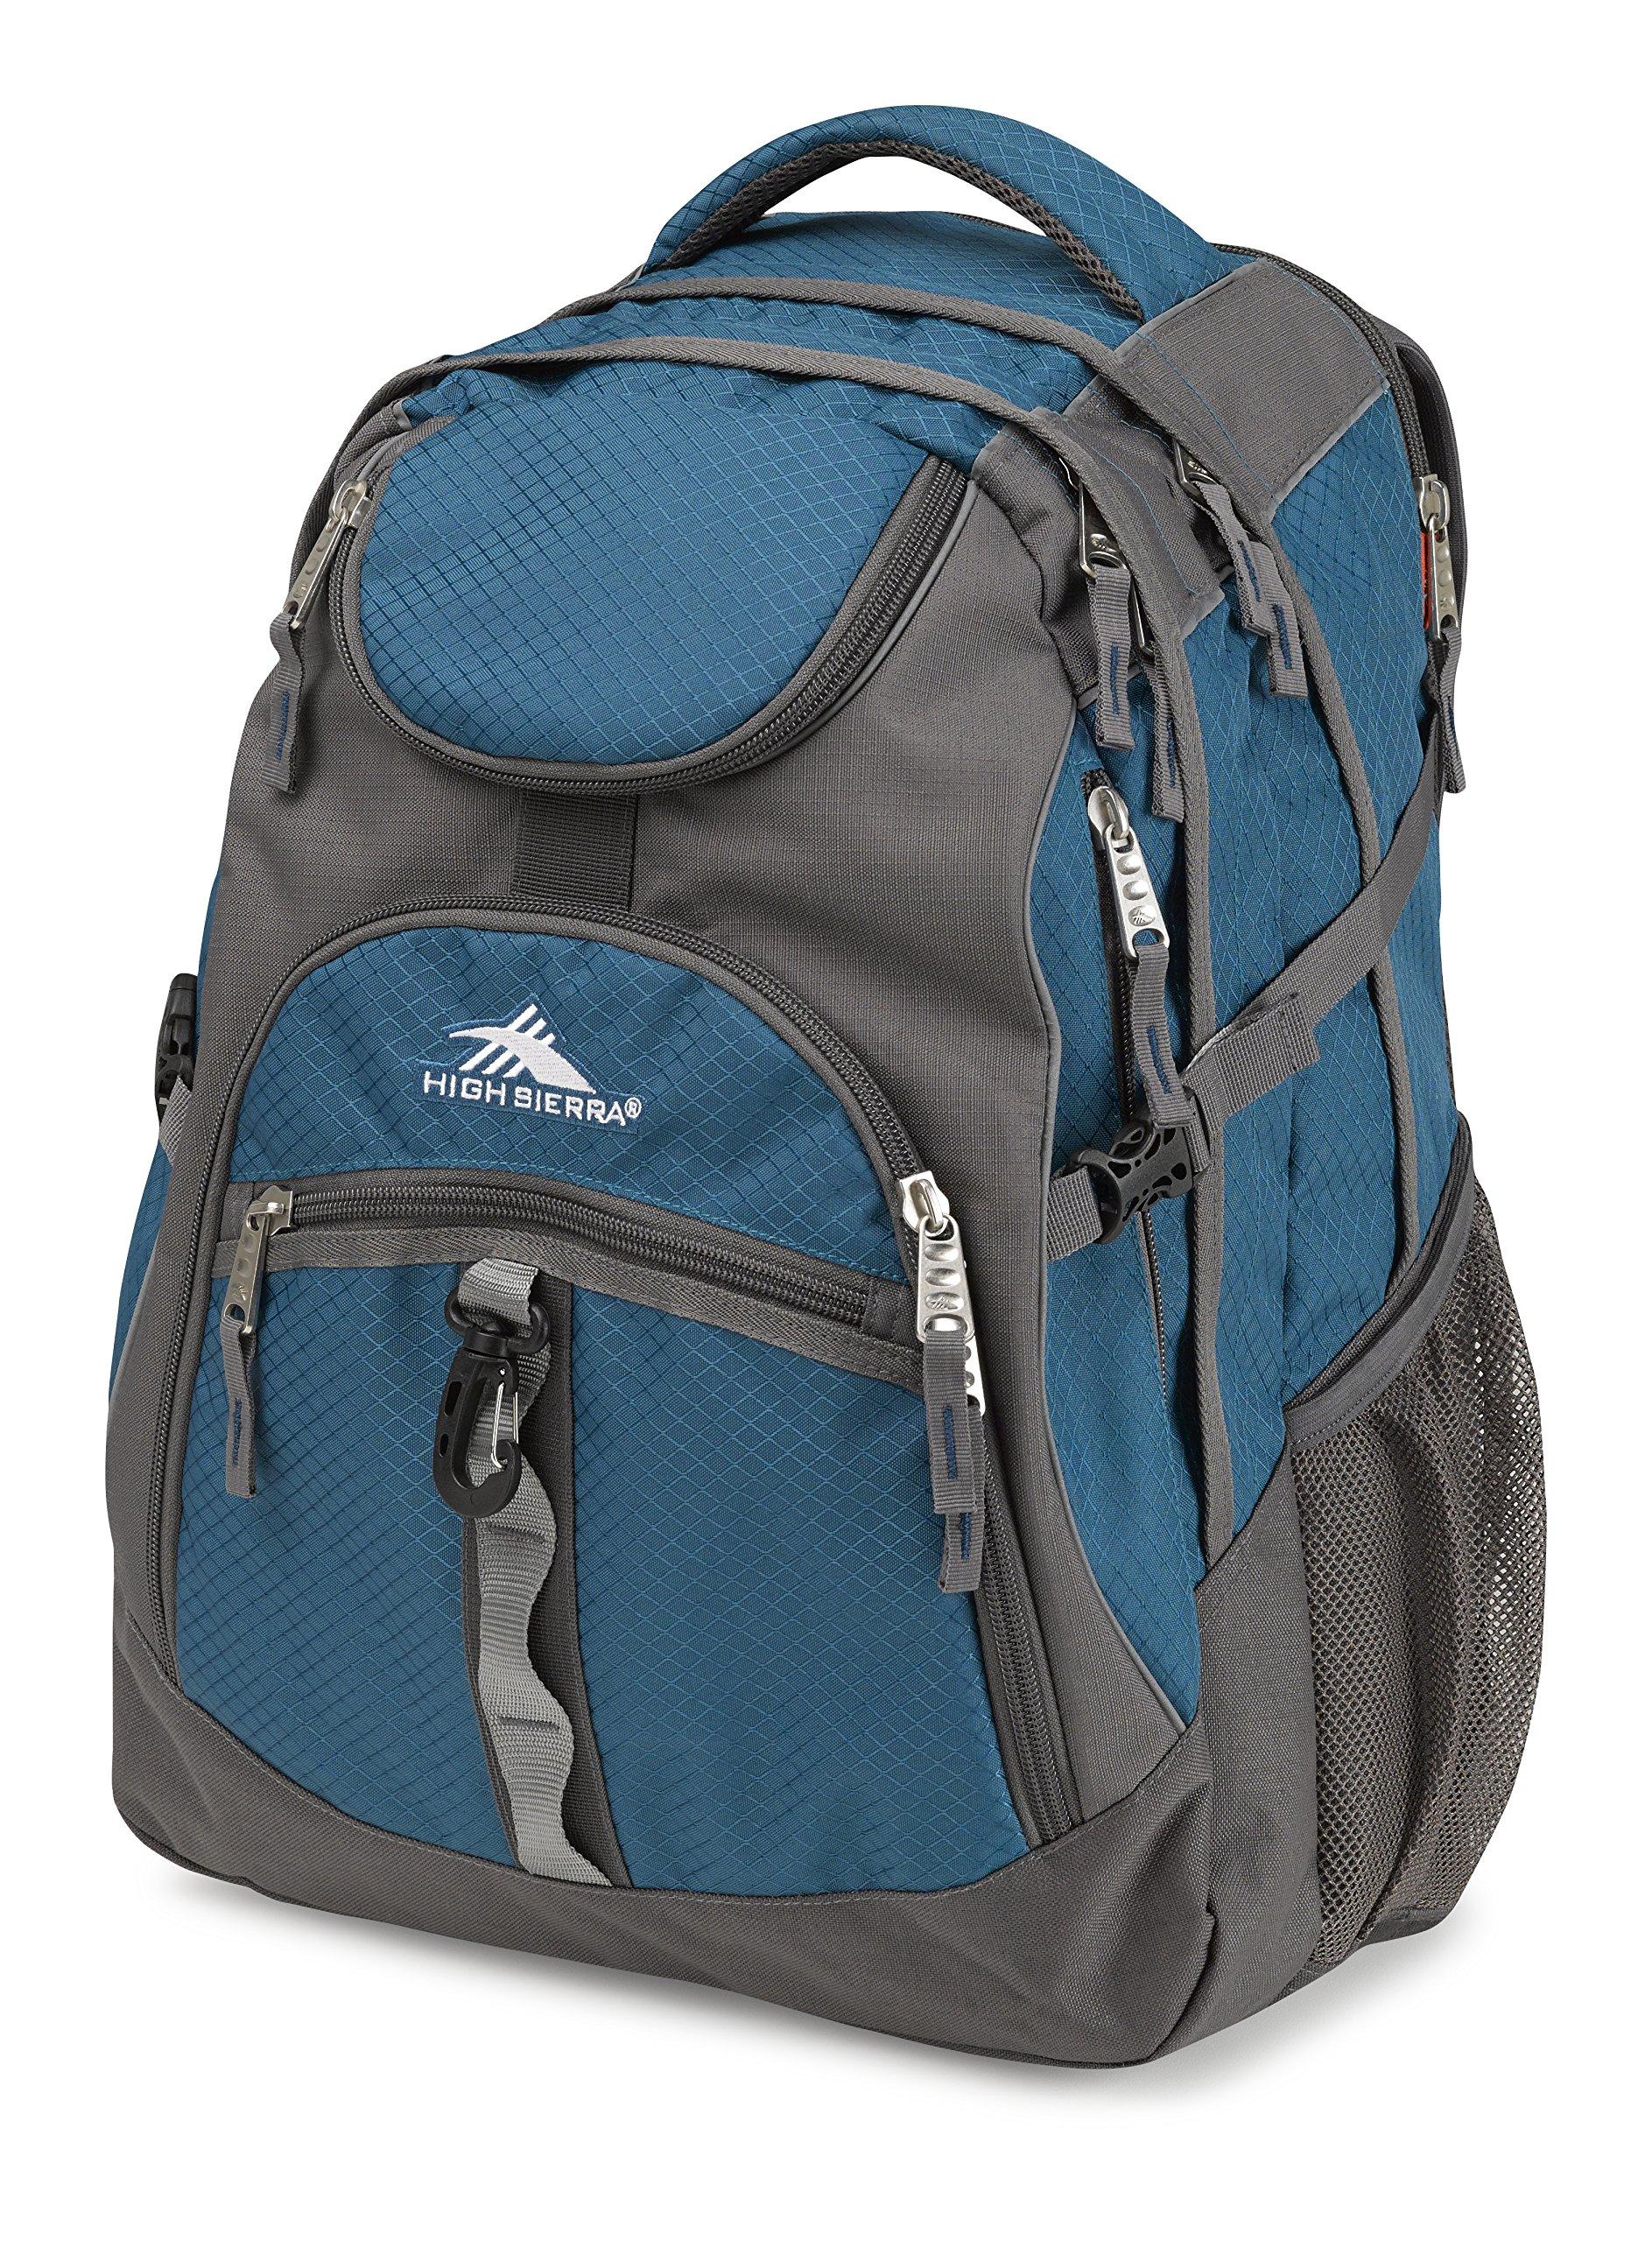 26a9cb822 Galleon - High Sierra Access Laptop Backpack, Lagoon/Slate